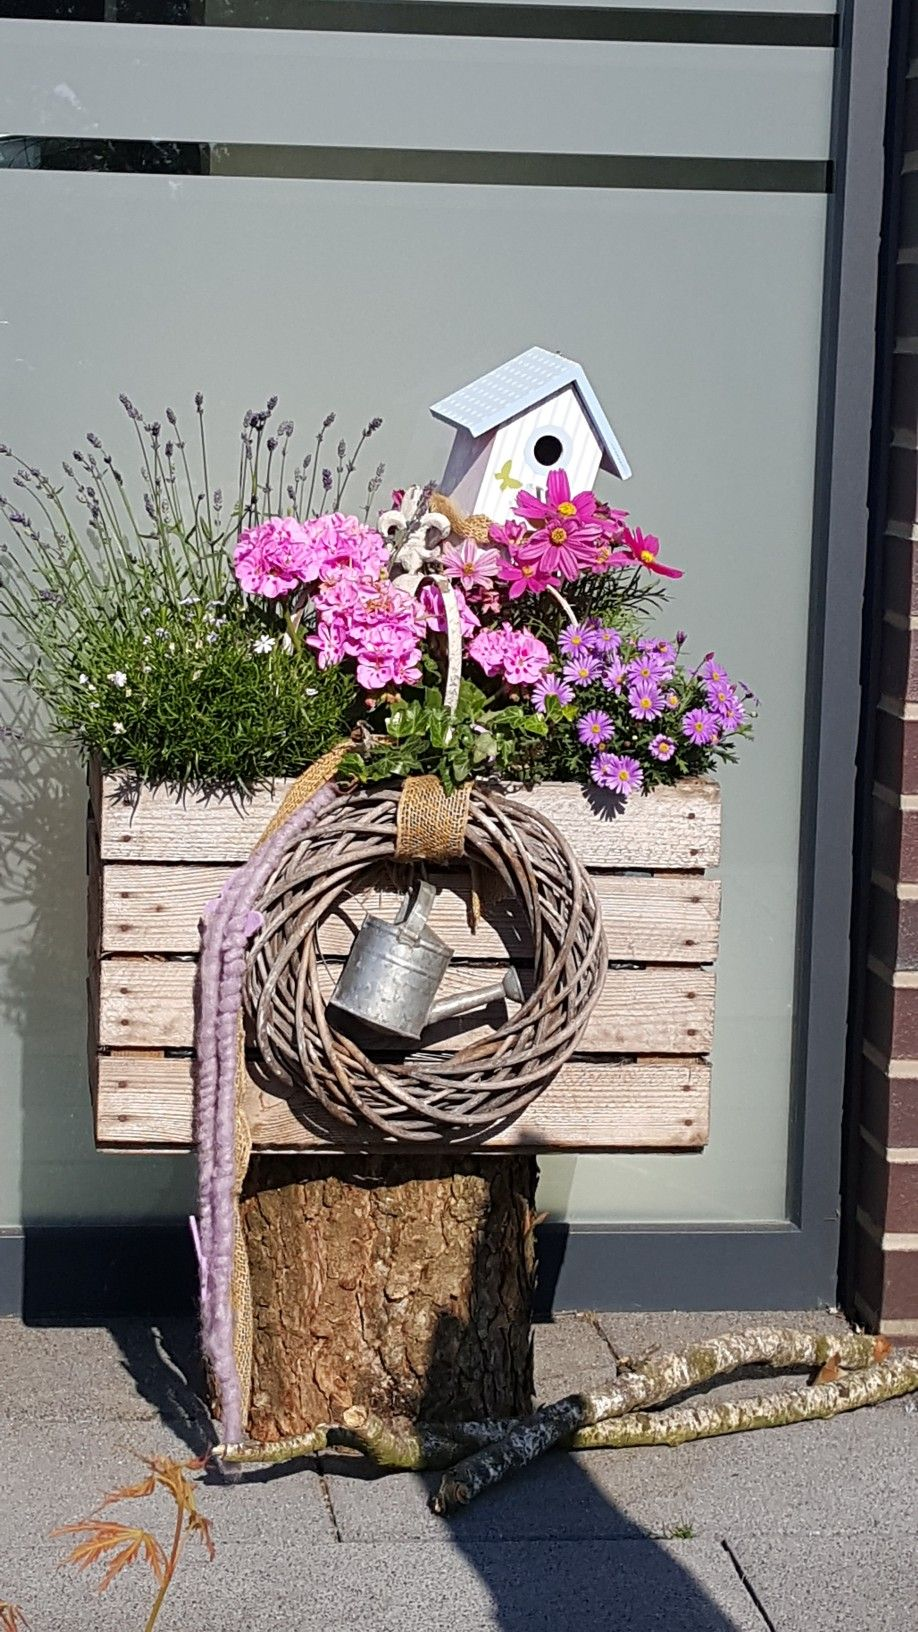 Hauseingang Deko Frisch sommerdeko Blumendeko Haustür Eingang Deko